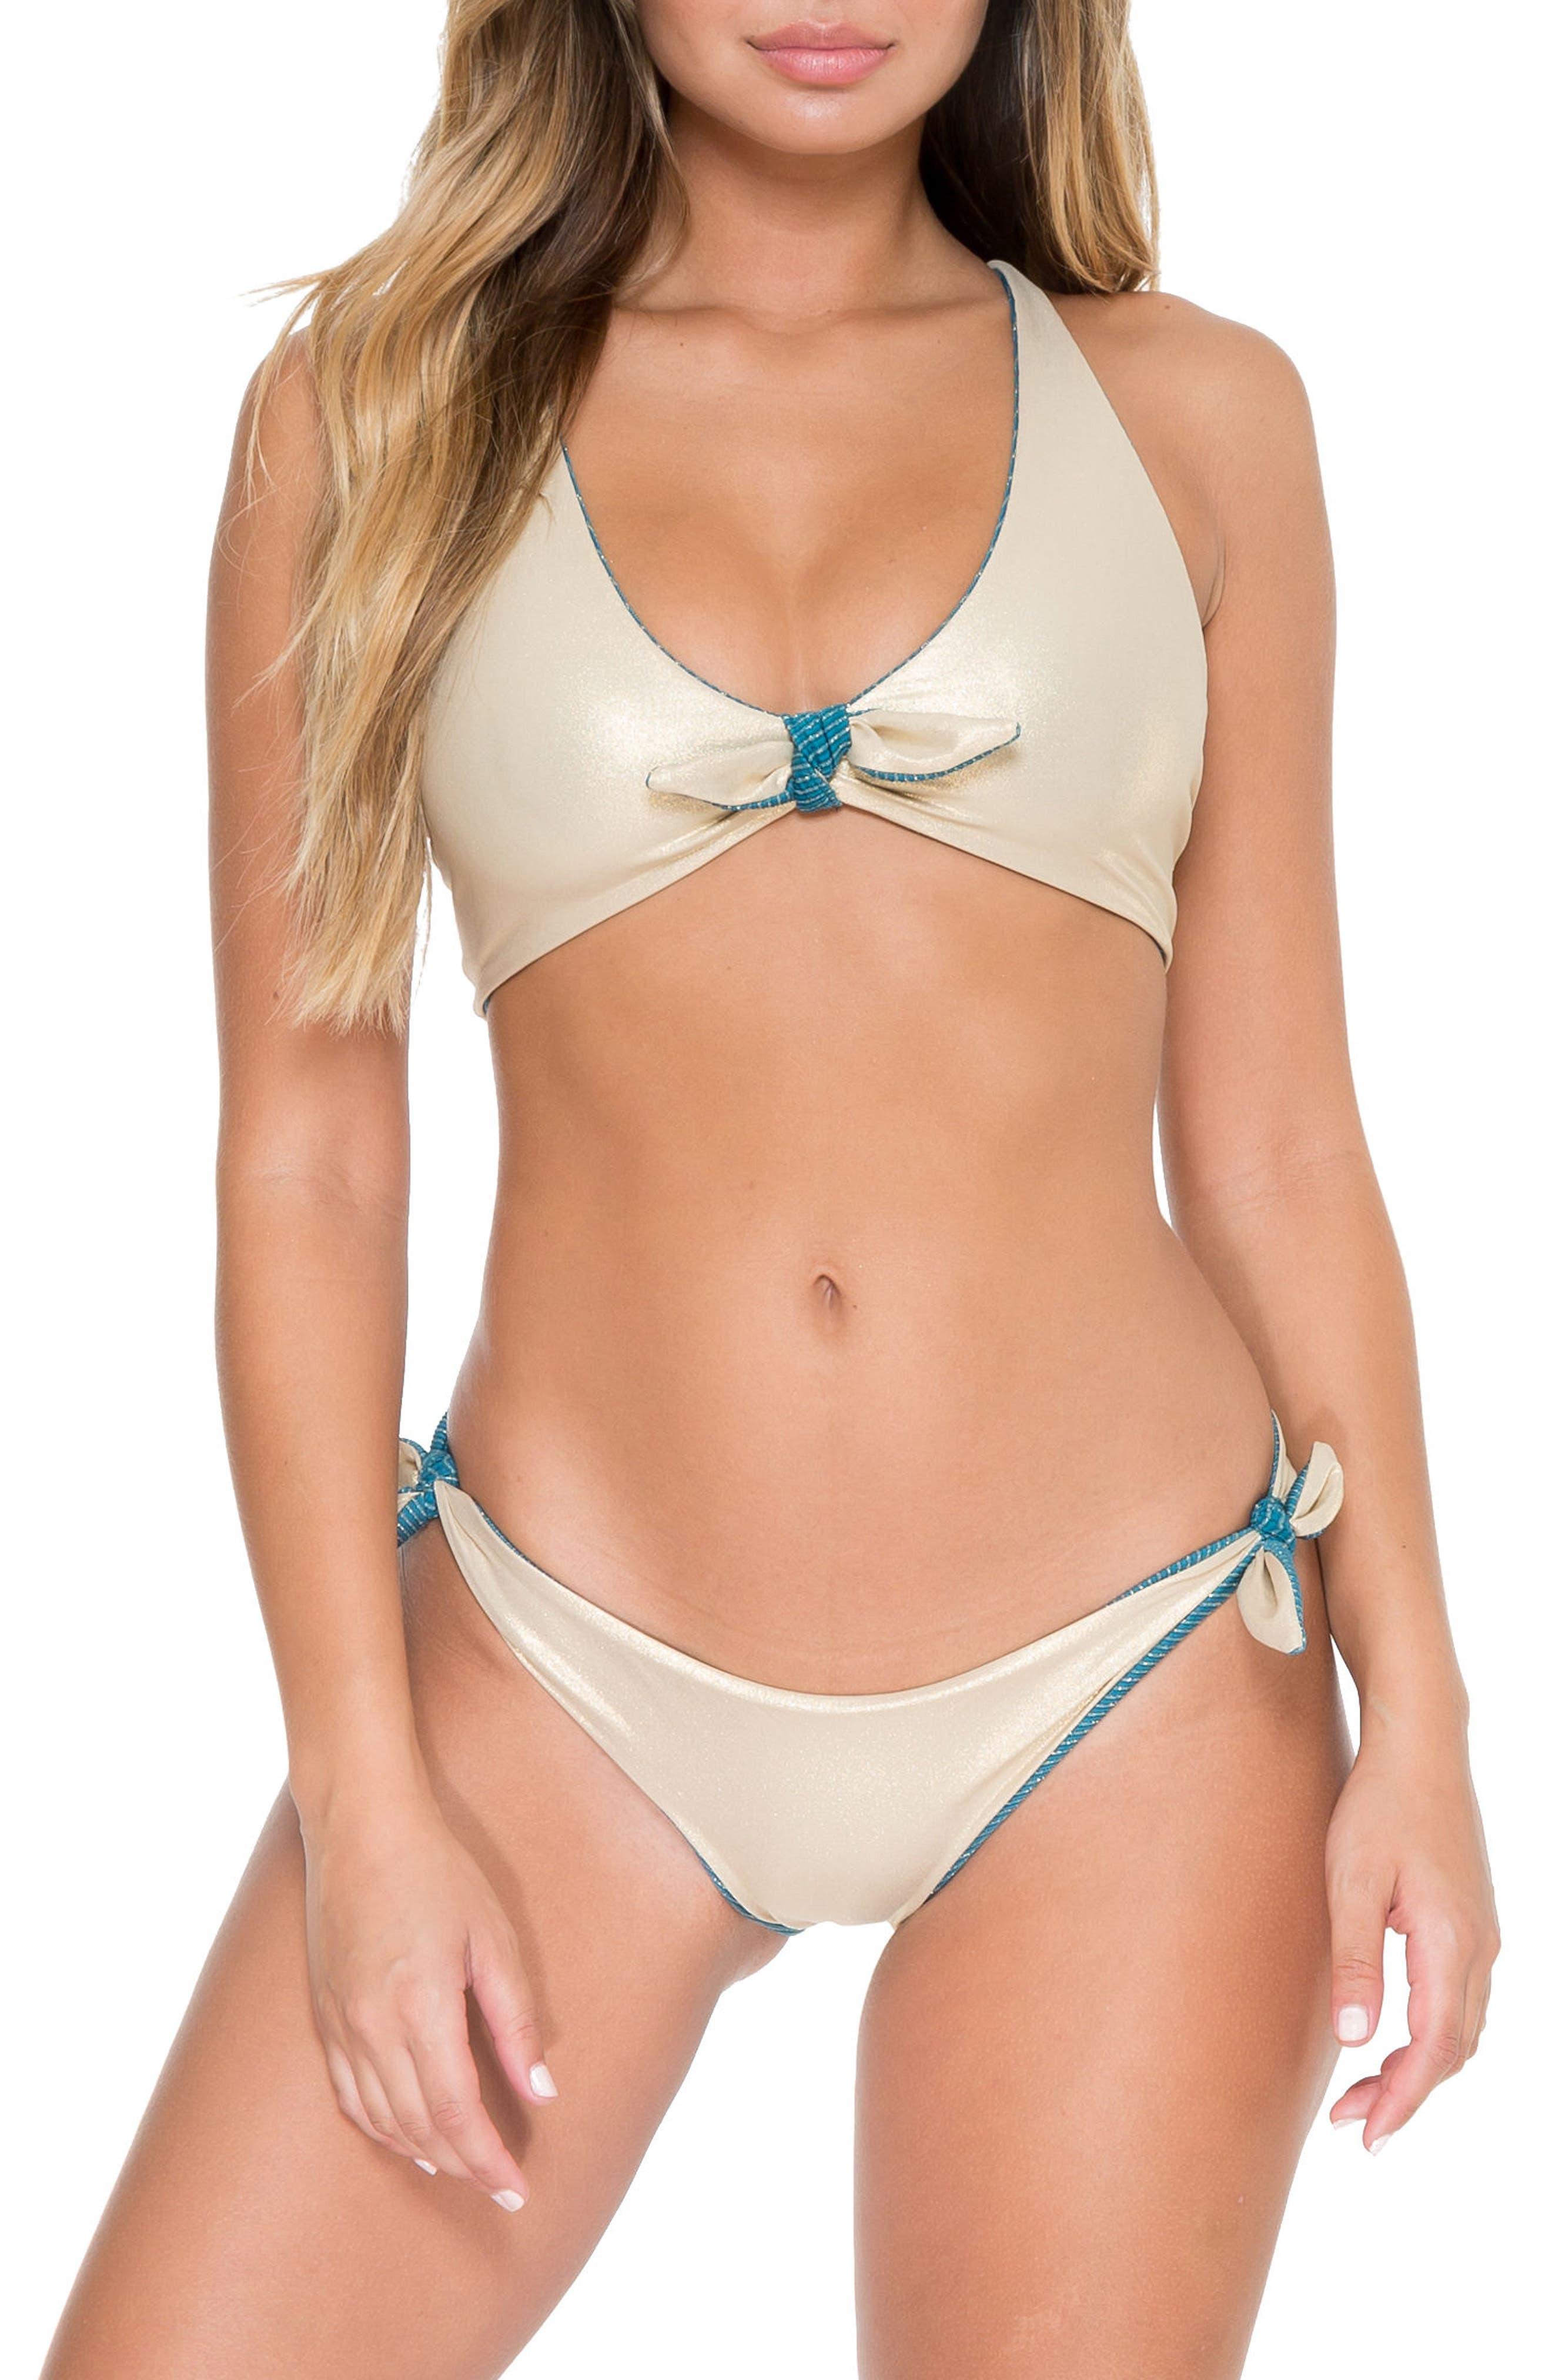 Cayo Hueso Reversible Bikini Bottoms,                             Alternate thumbnail 6, color,                             Miramar Blue/ Gold